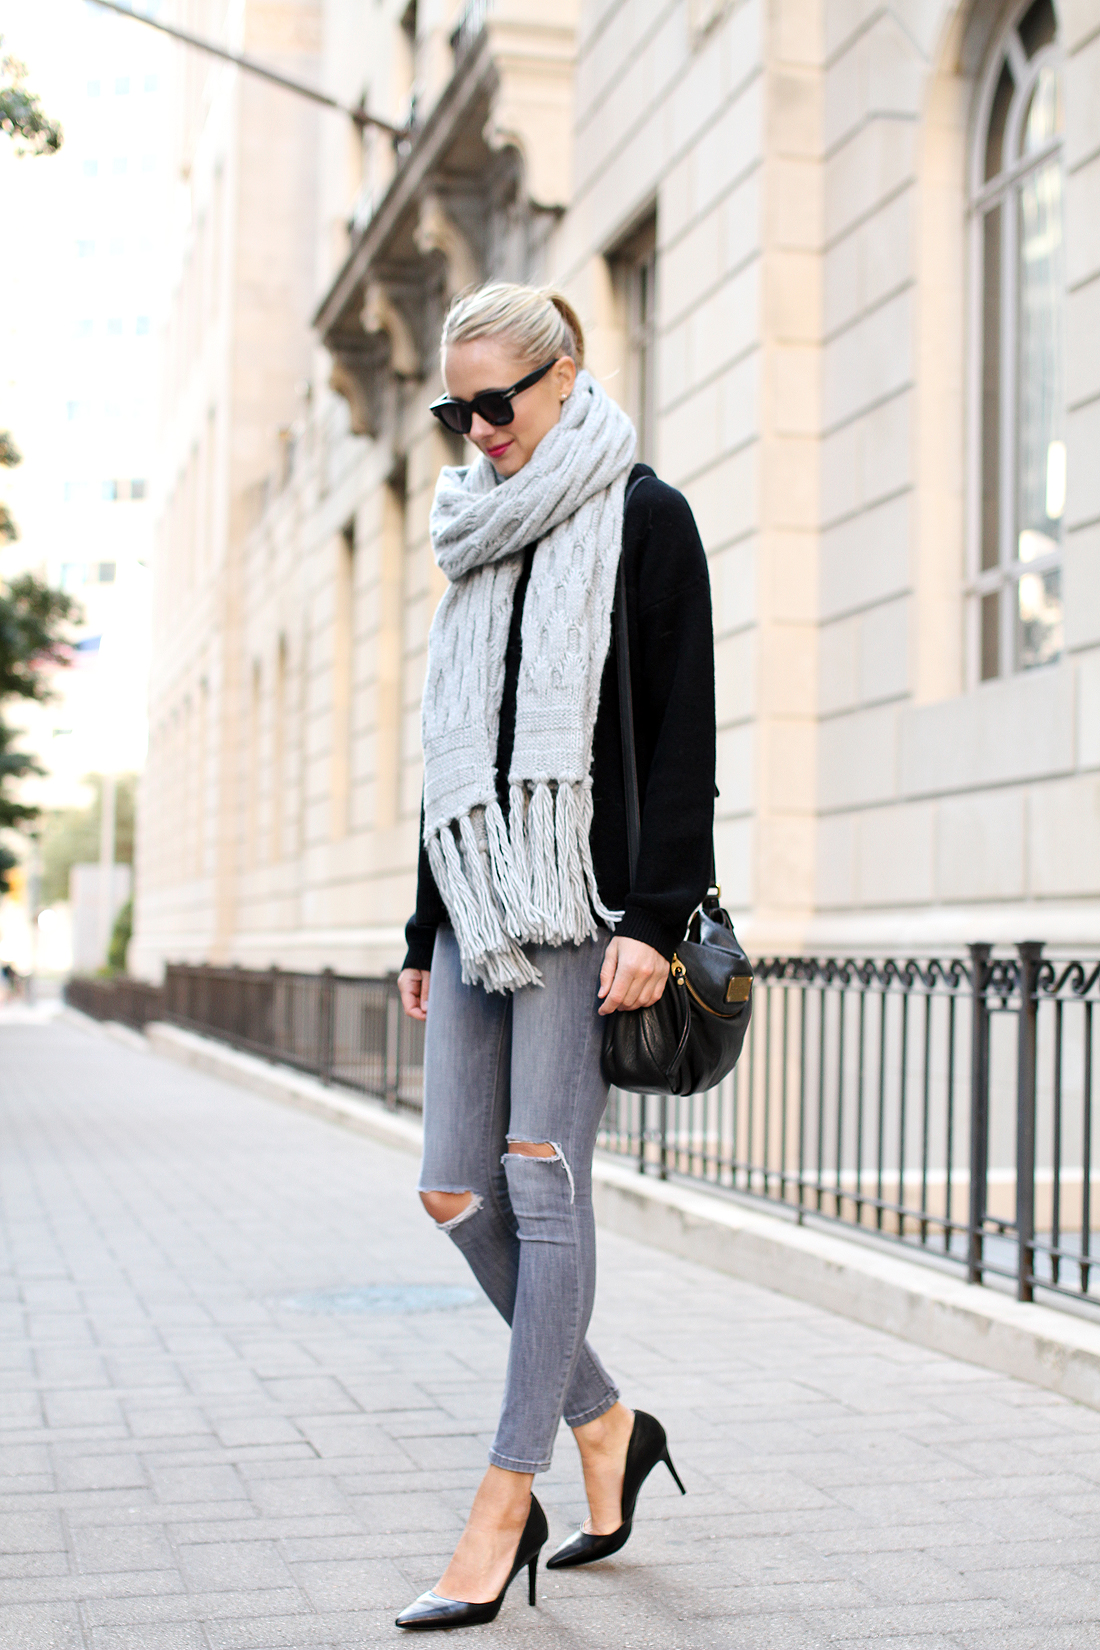 fashion-jackson-banana-republic-grey-fringe-scarf-black-sweater-grey-ripped-skinny-jeans-black-pumps-celine-sunglasses